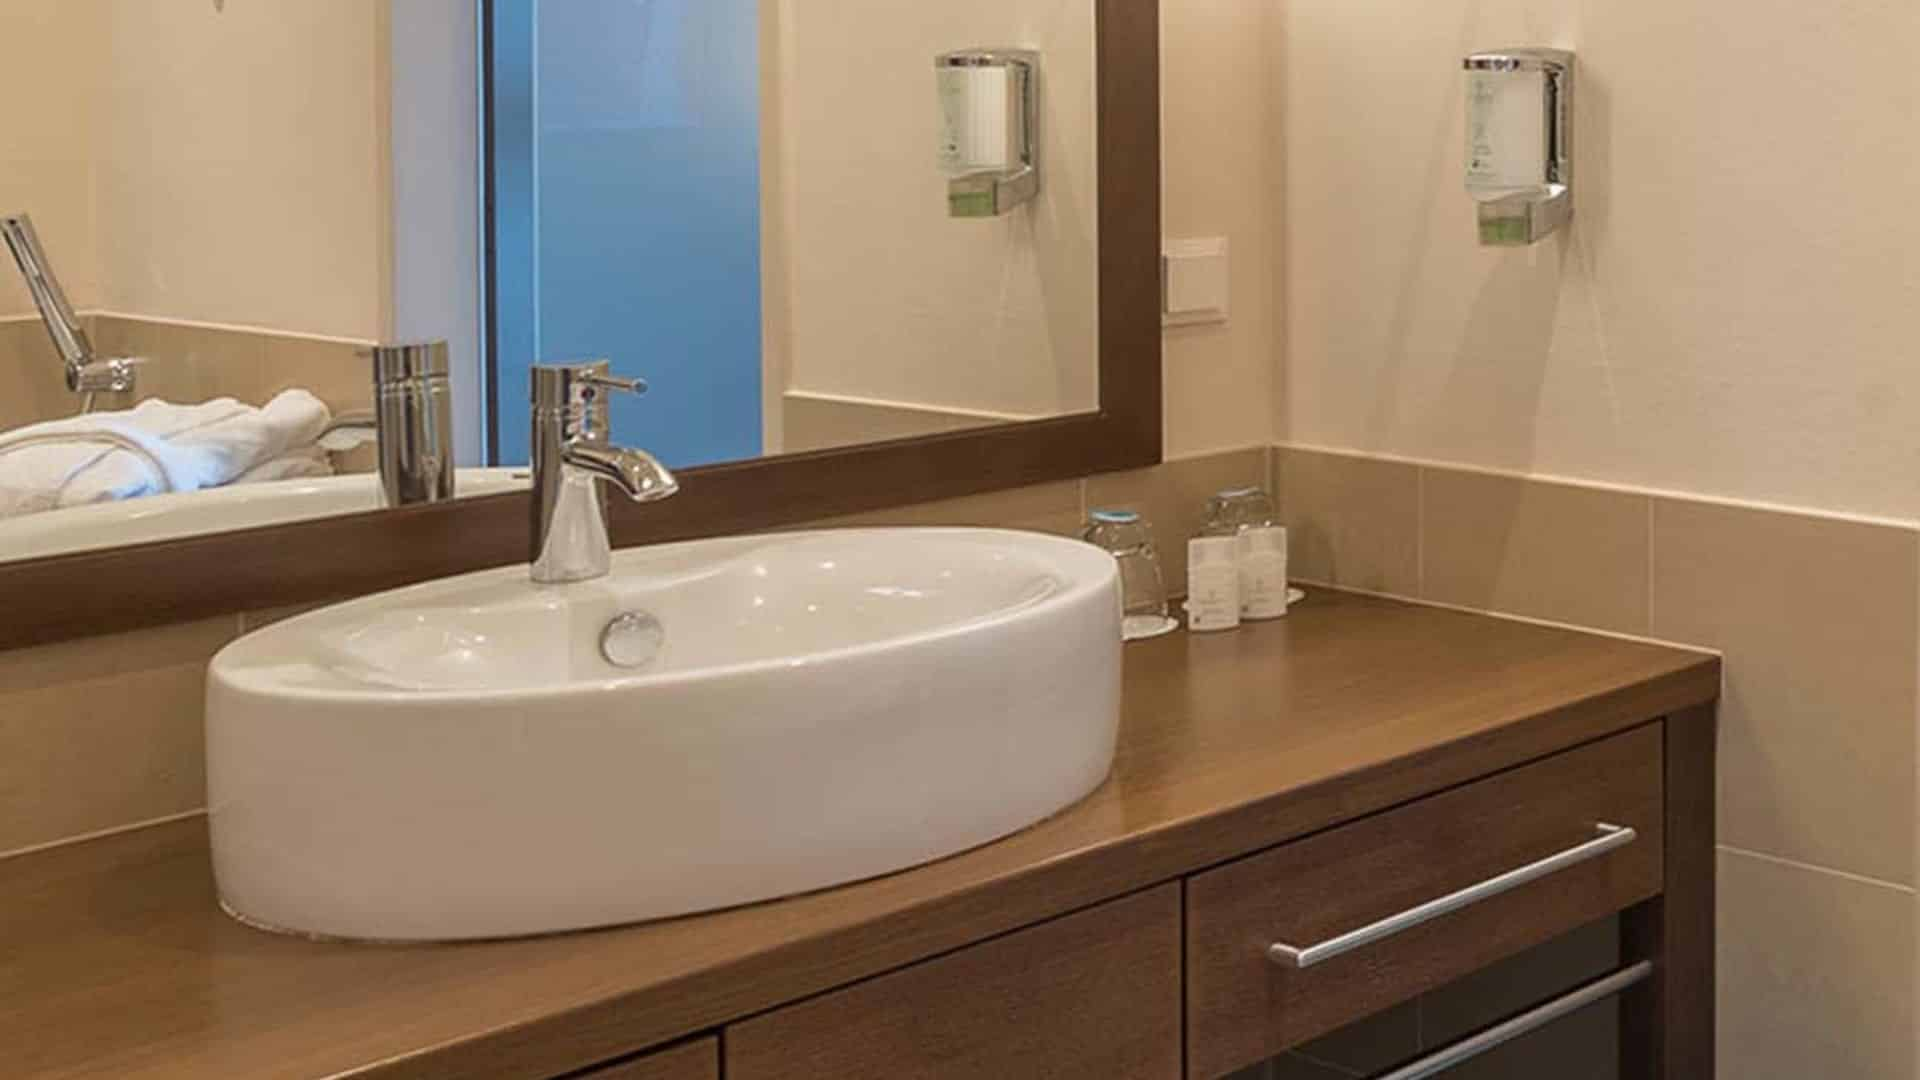 Badezimmer im Doppelzimmer im Wellnesshotel Larimar